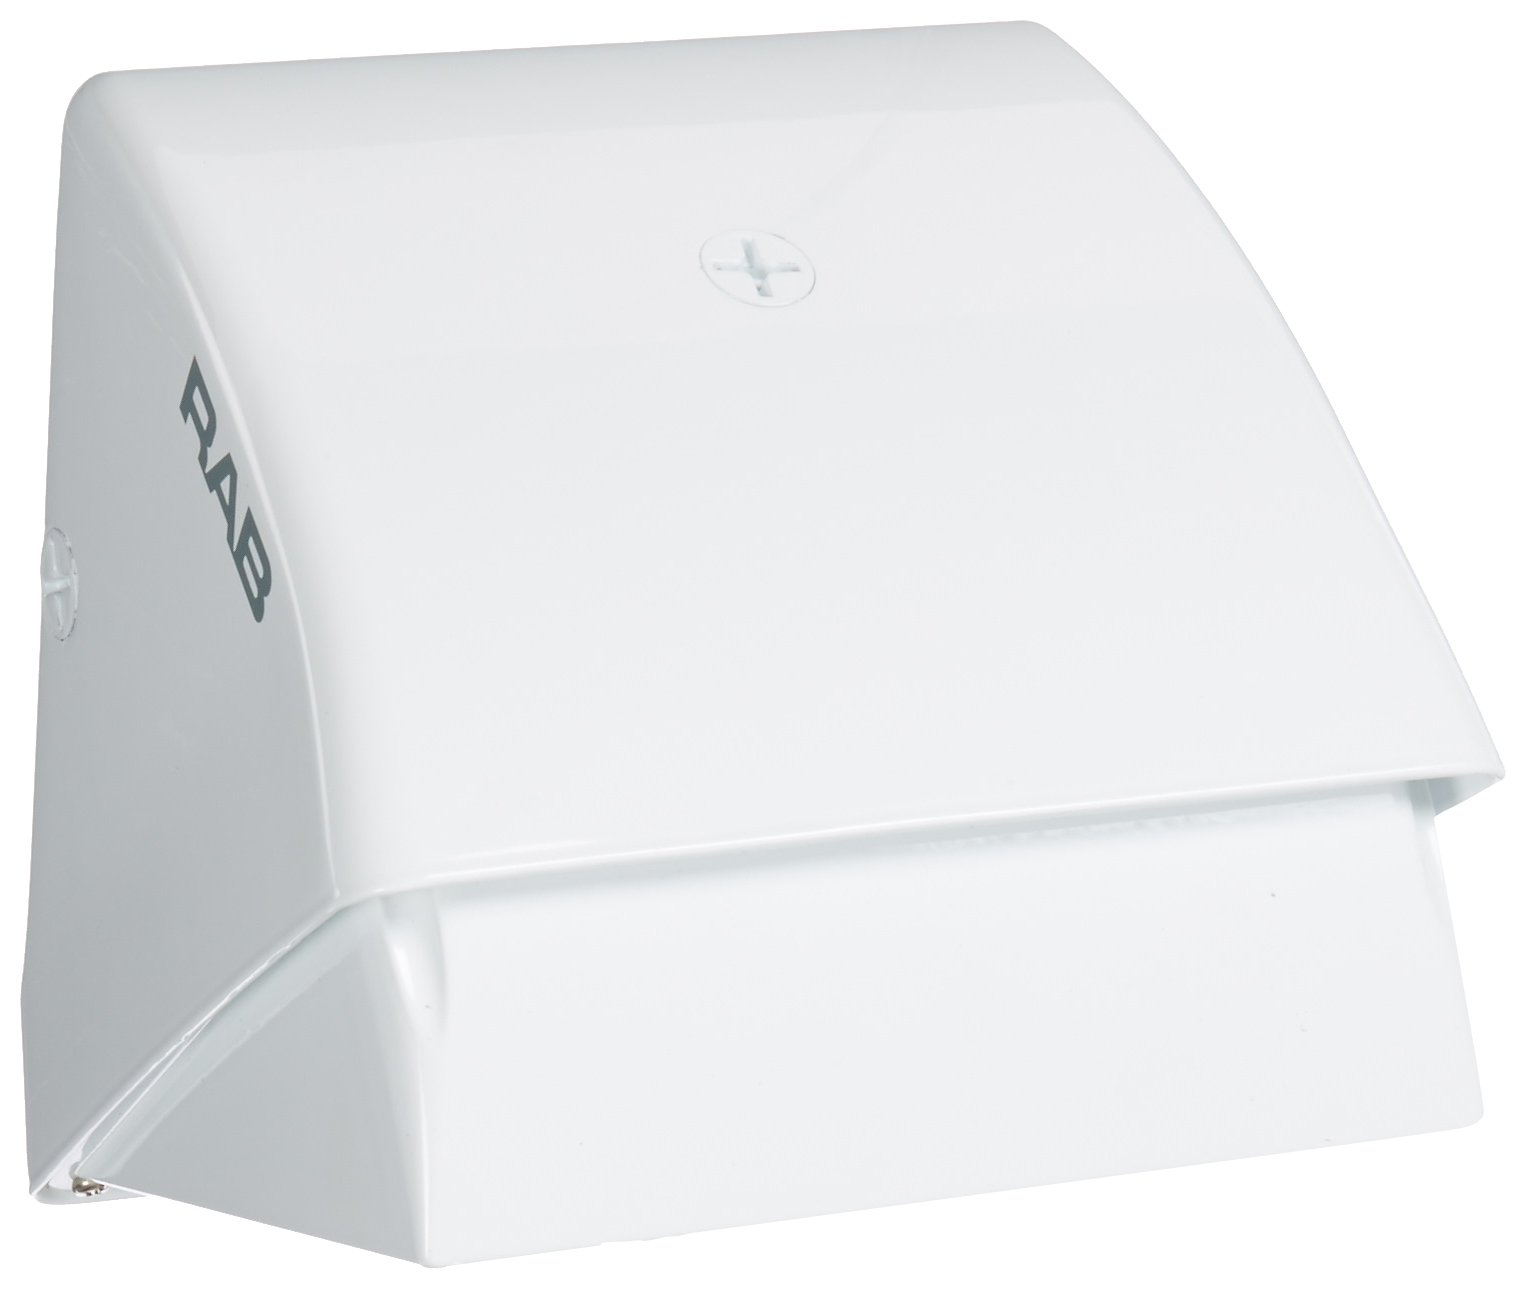 RAB Lighting WP1CSN50W WP1 High Pressure Sodium Wallpack with Cutoff Glare Shield, ED17 Type, Aluminum, 50W Power, 4000 Lumens, 120V, White